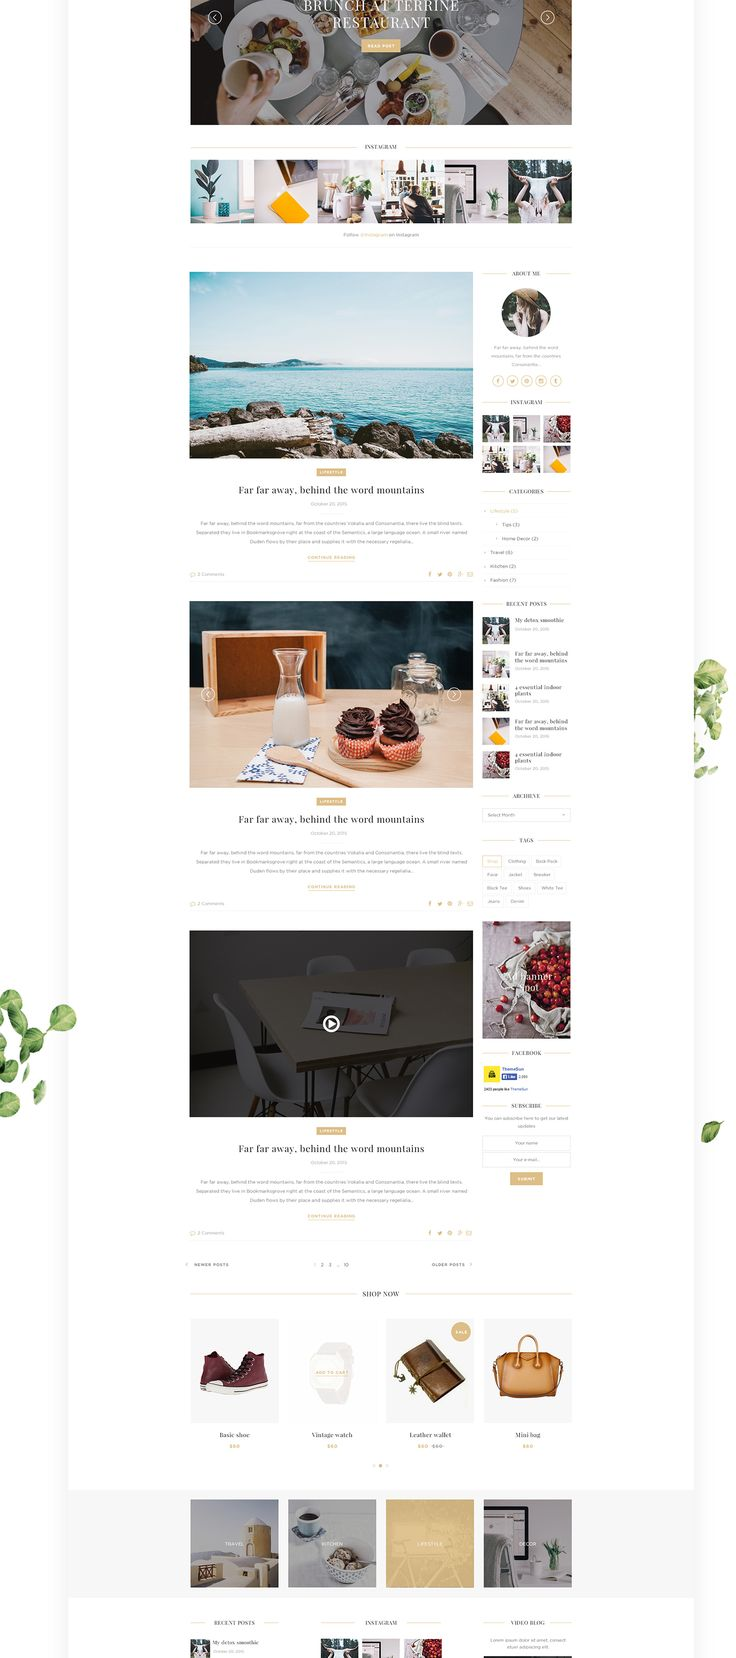 60 best Blog images on Pinterest | Application design, Branding ...